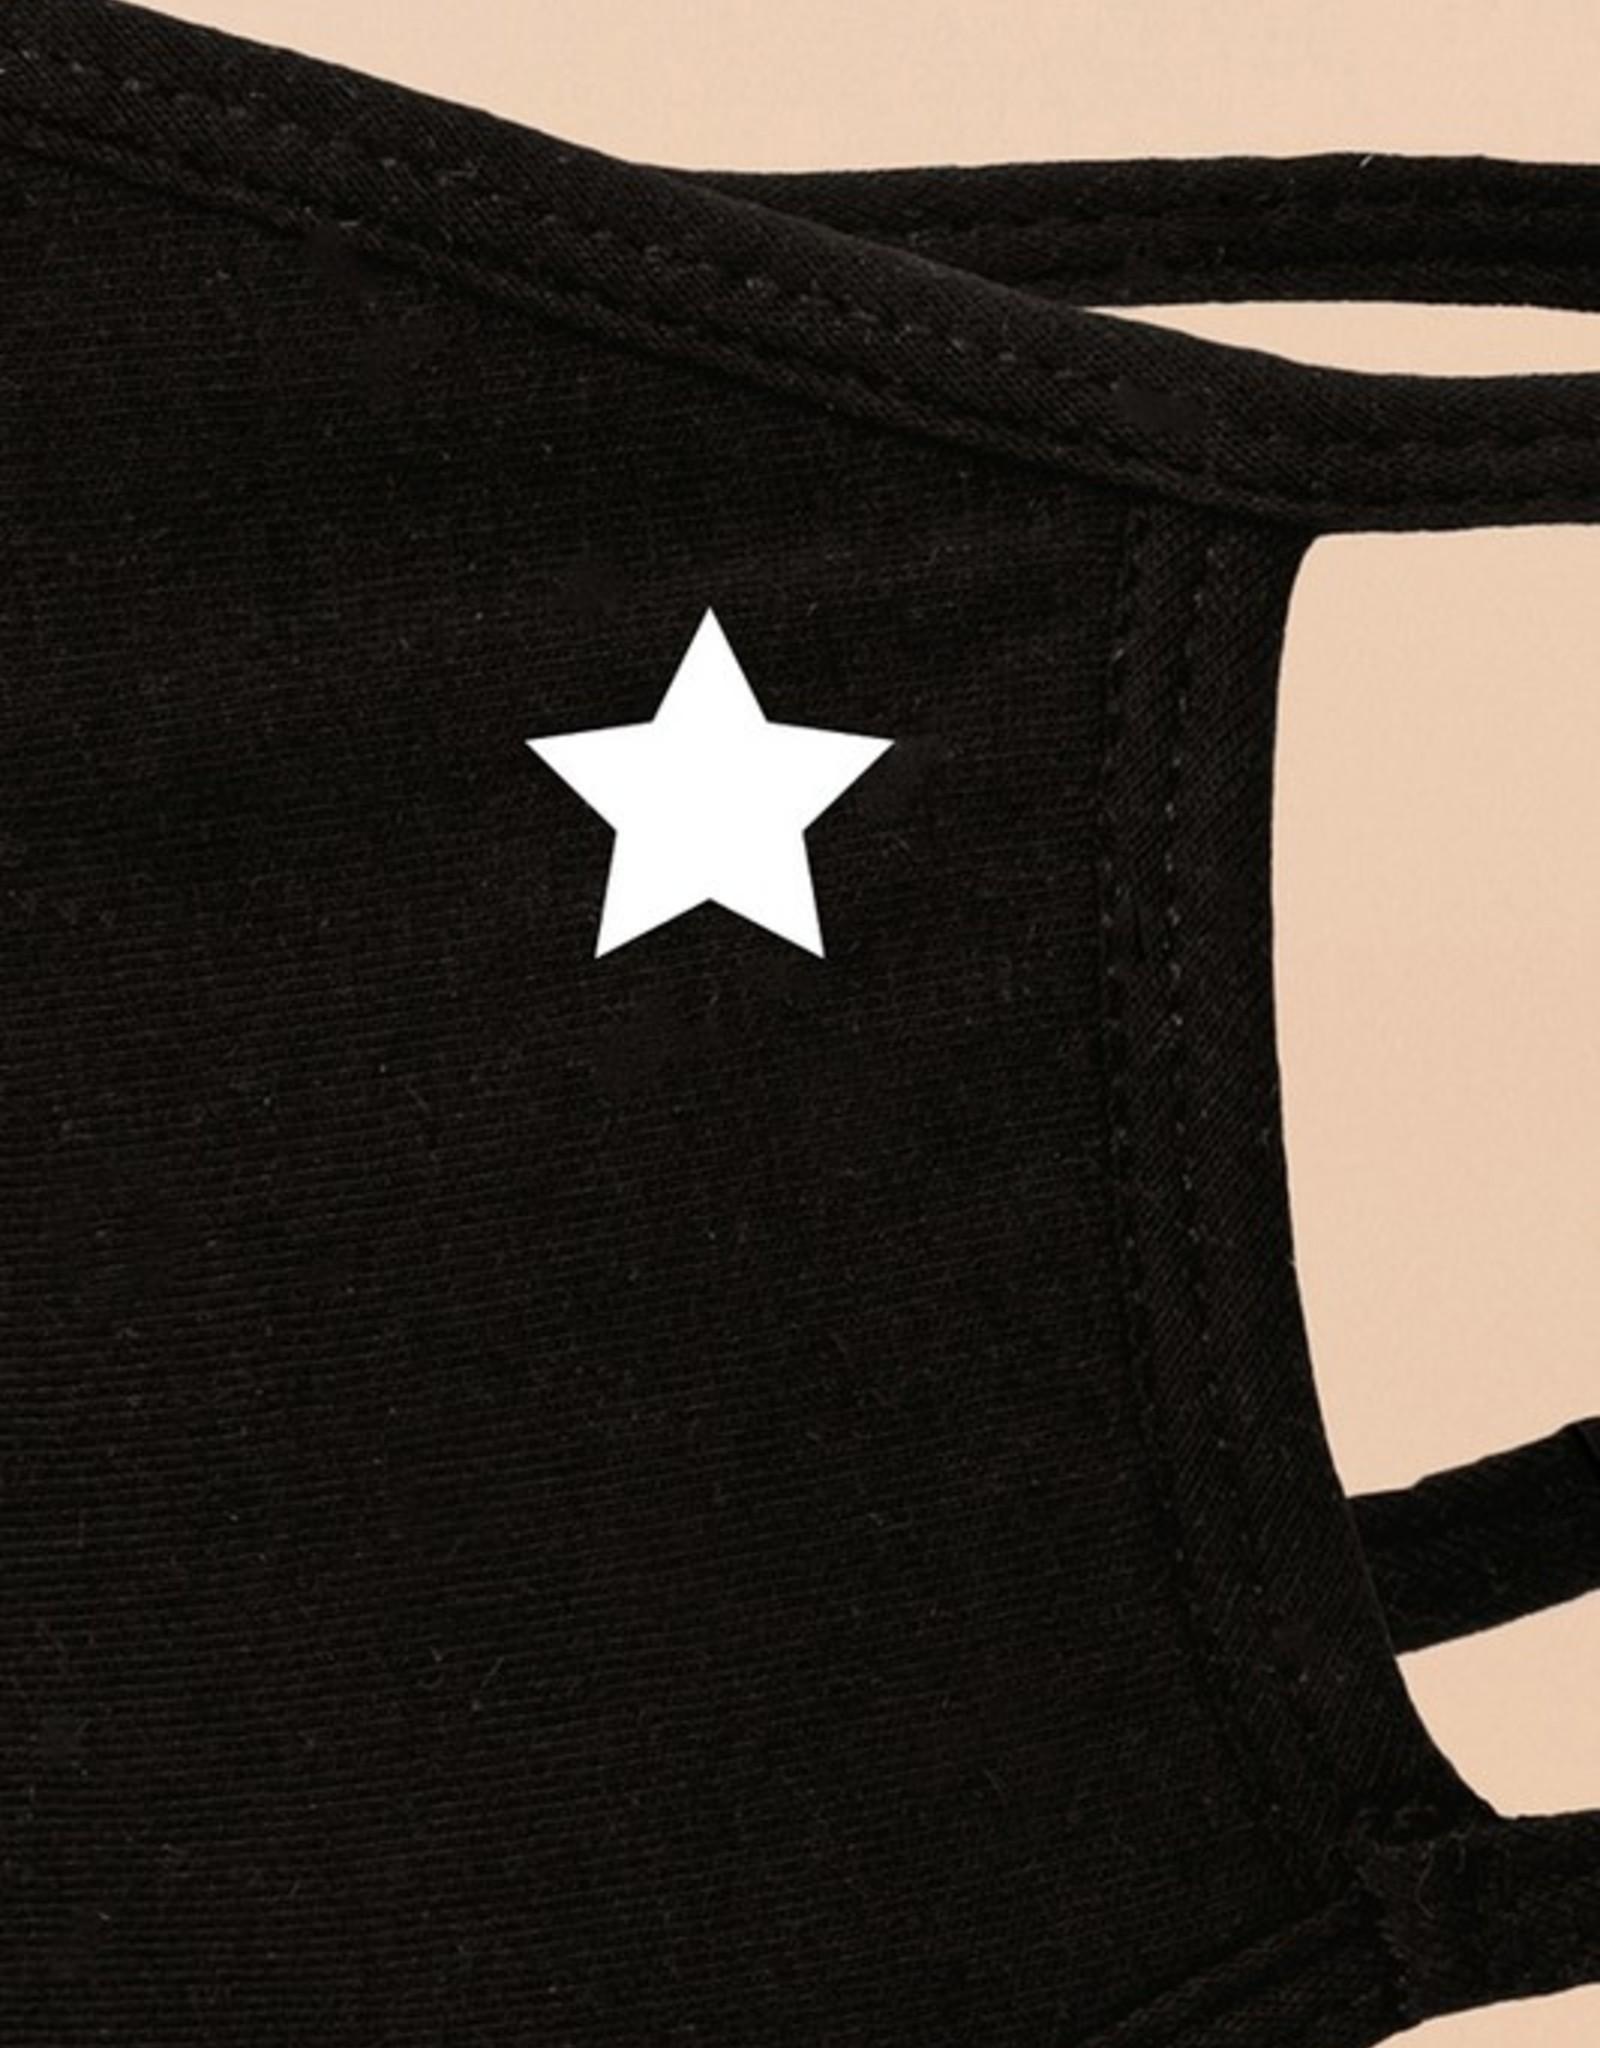 single star mask